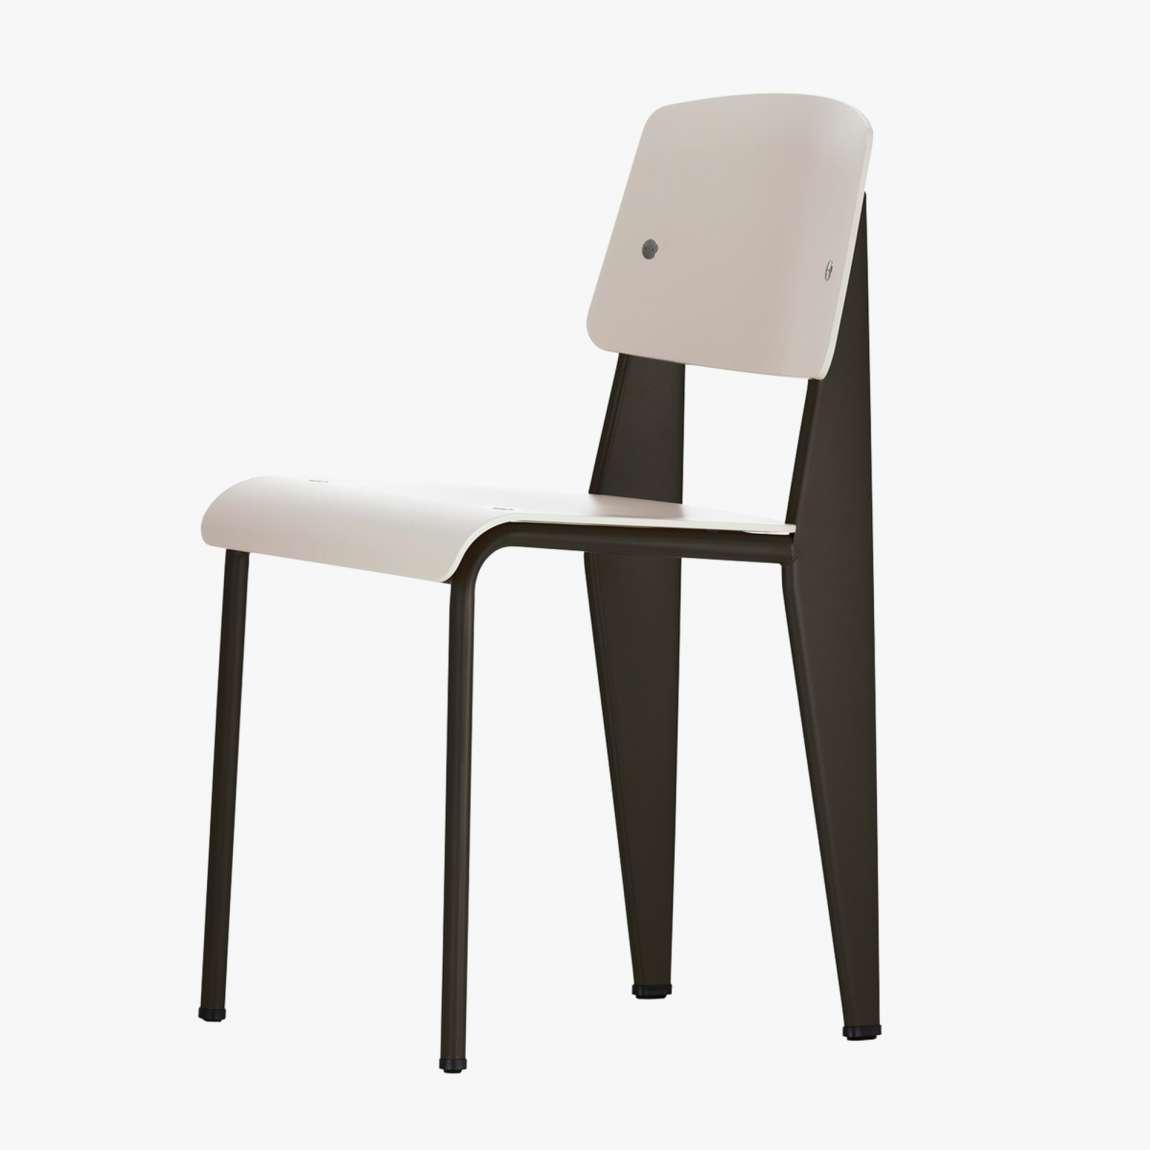 Stuhl Klassiker Holz stuhl klassiker prouve einzigartige formsprache in stahl und